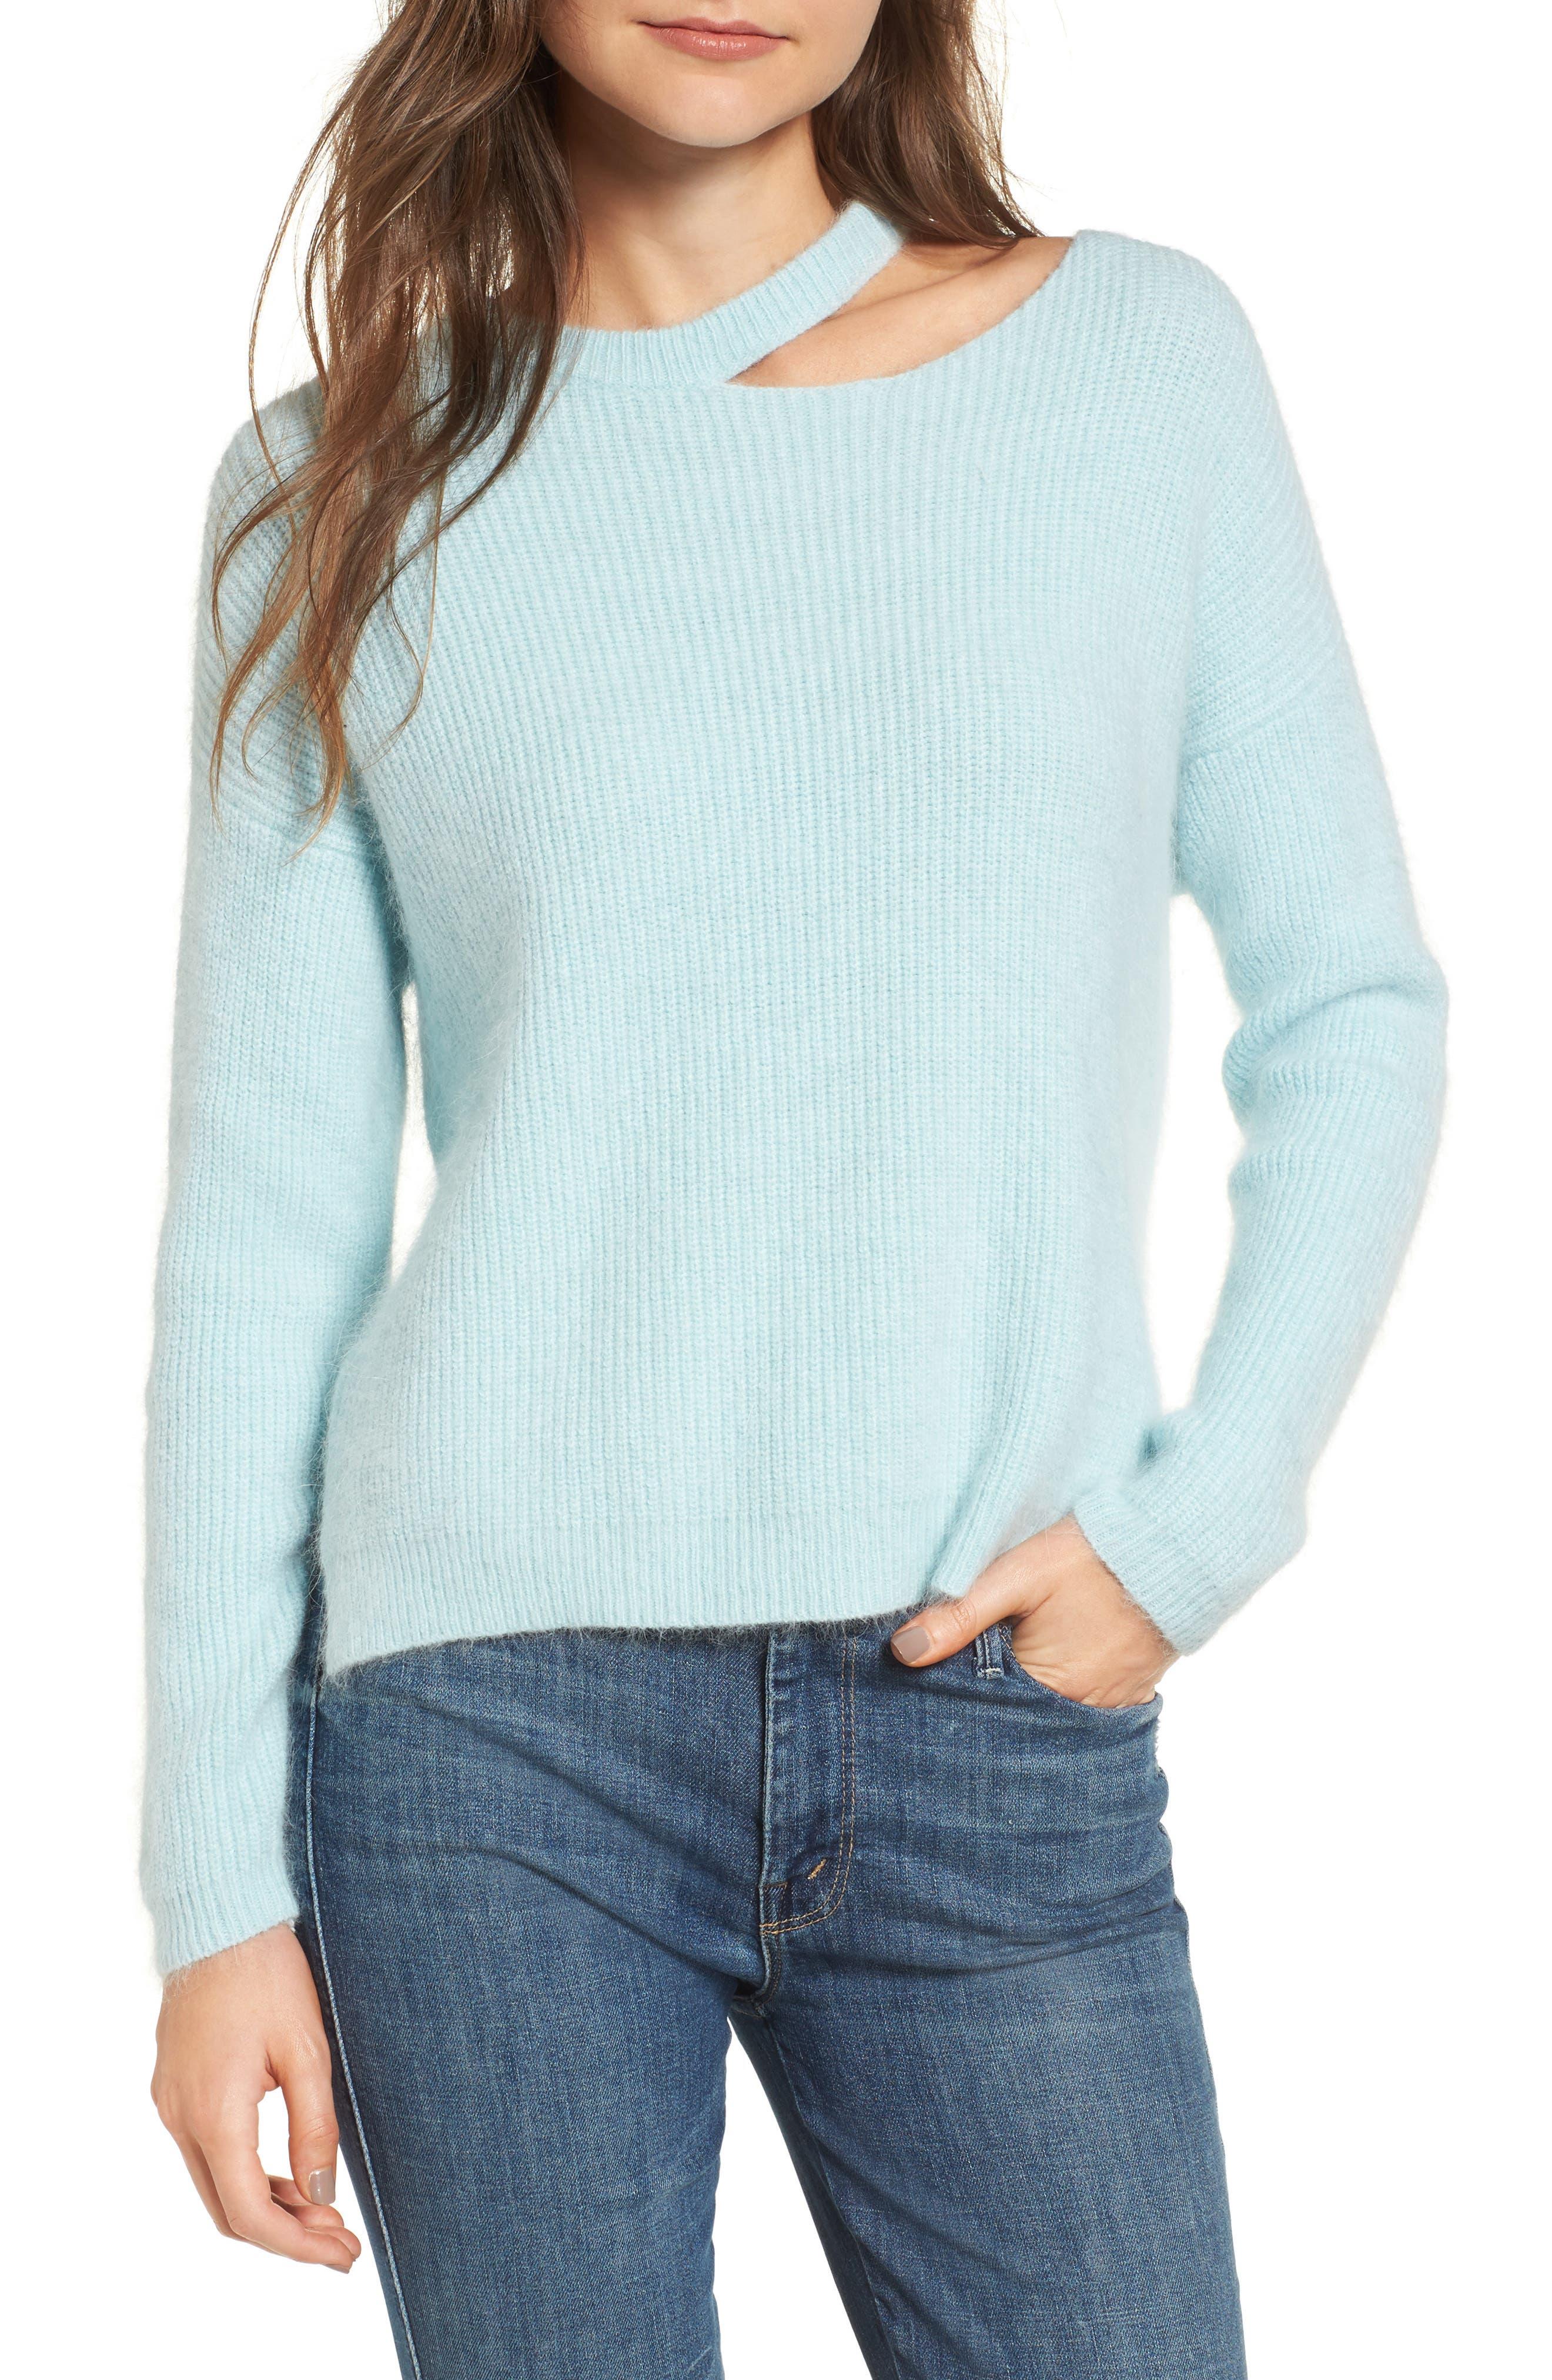 Ovidian Sweater,                             Main thumbnail 1, color,                             460